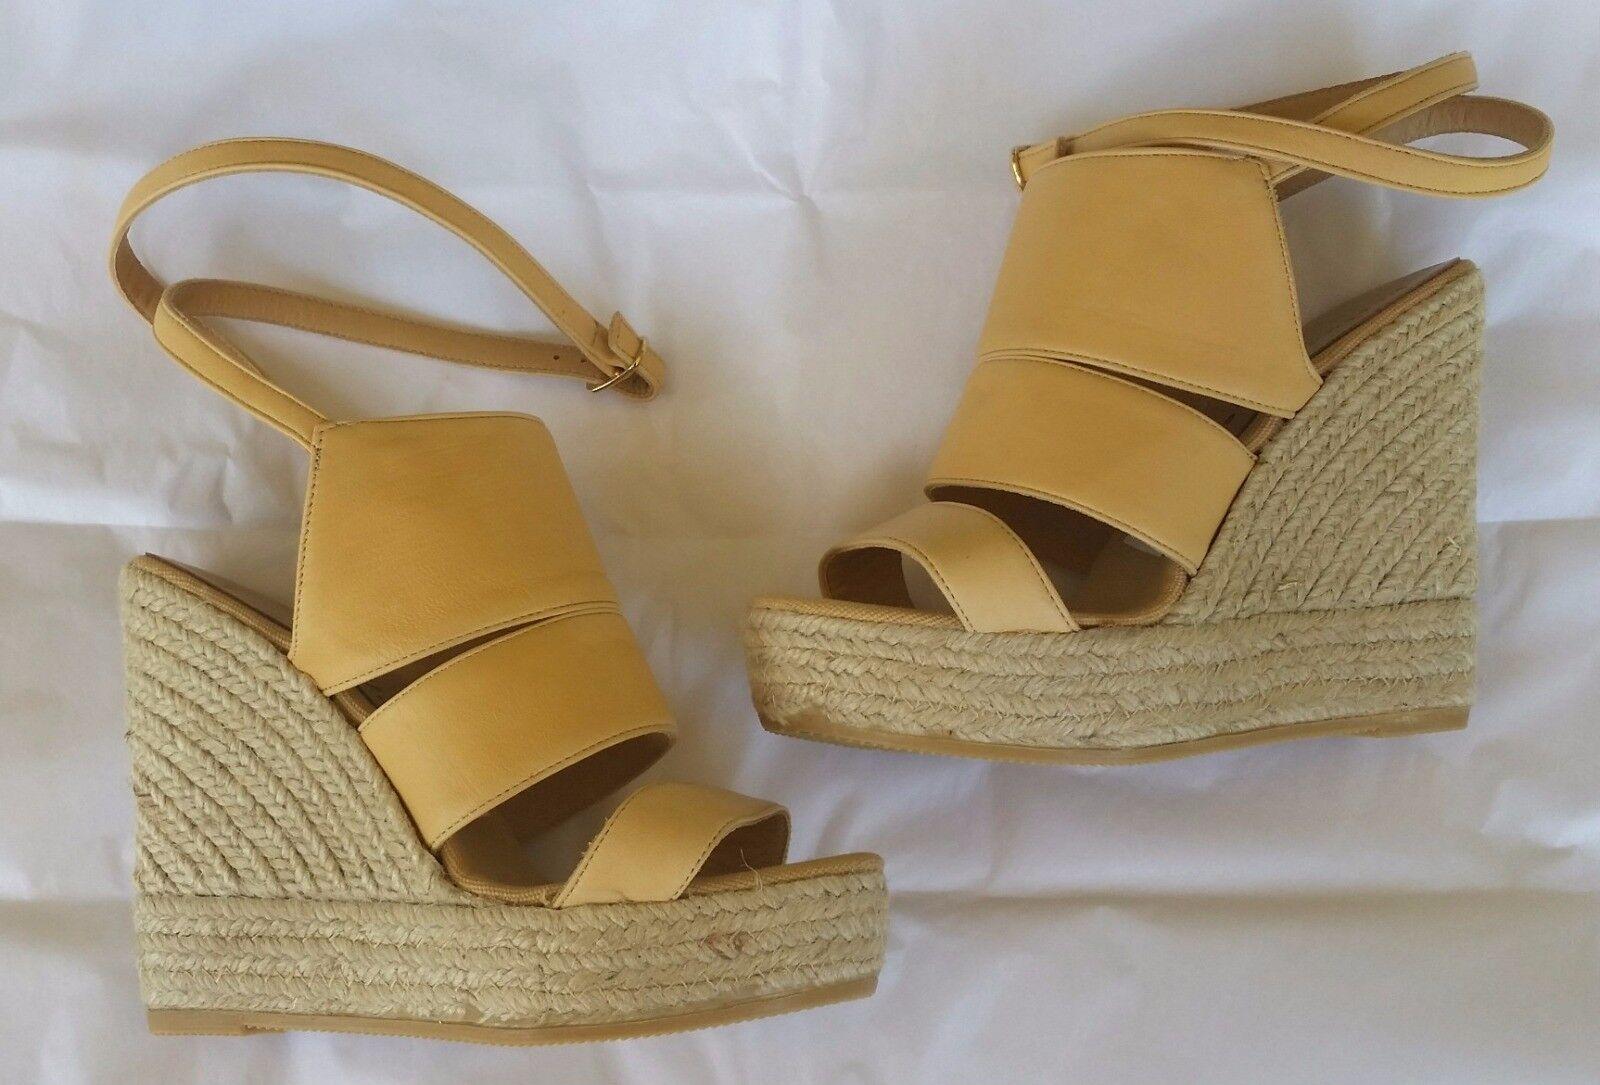 NIB BETTYE MULLER Scan Tan Leder Ankle Strap Wedge Espadrilles Schuhes 36